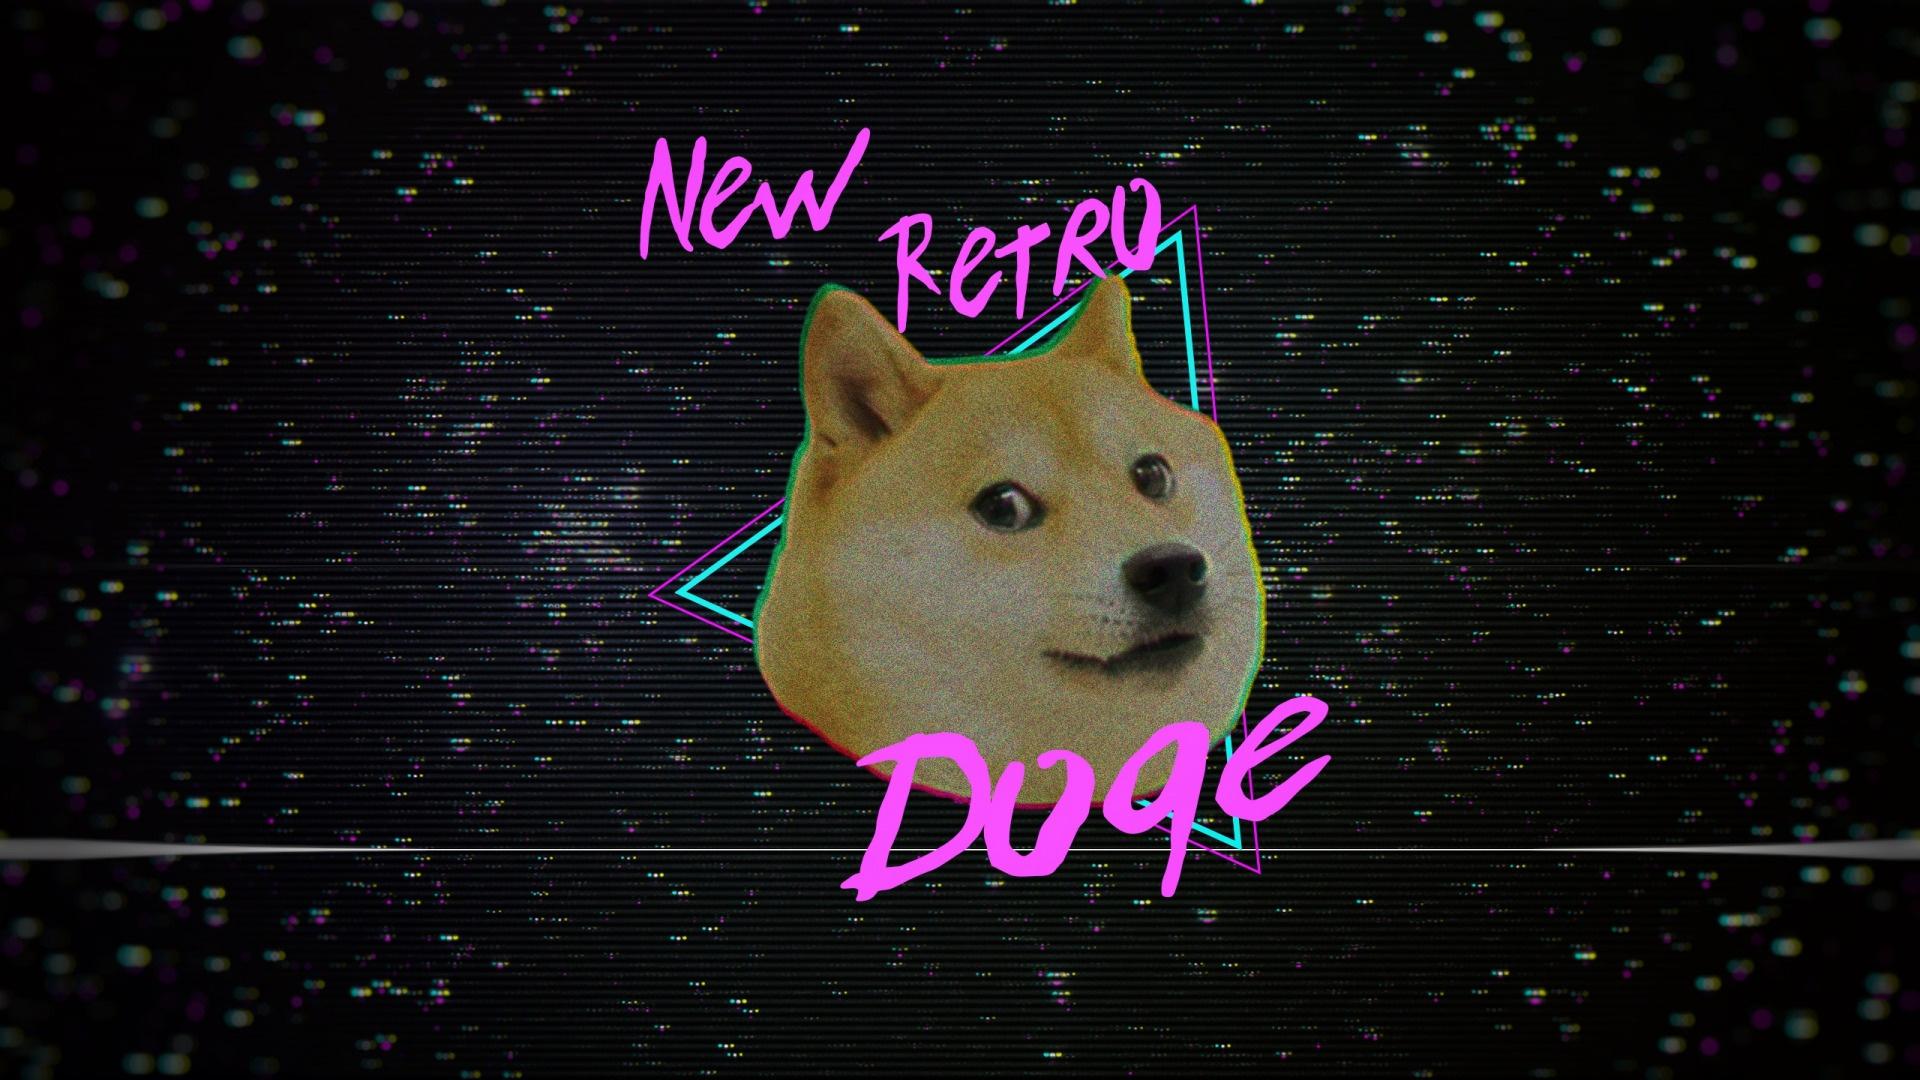 Doge Meme free image